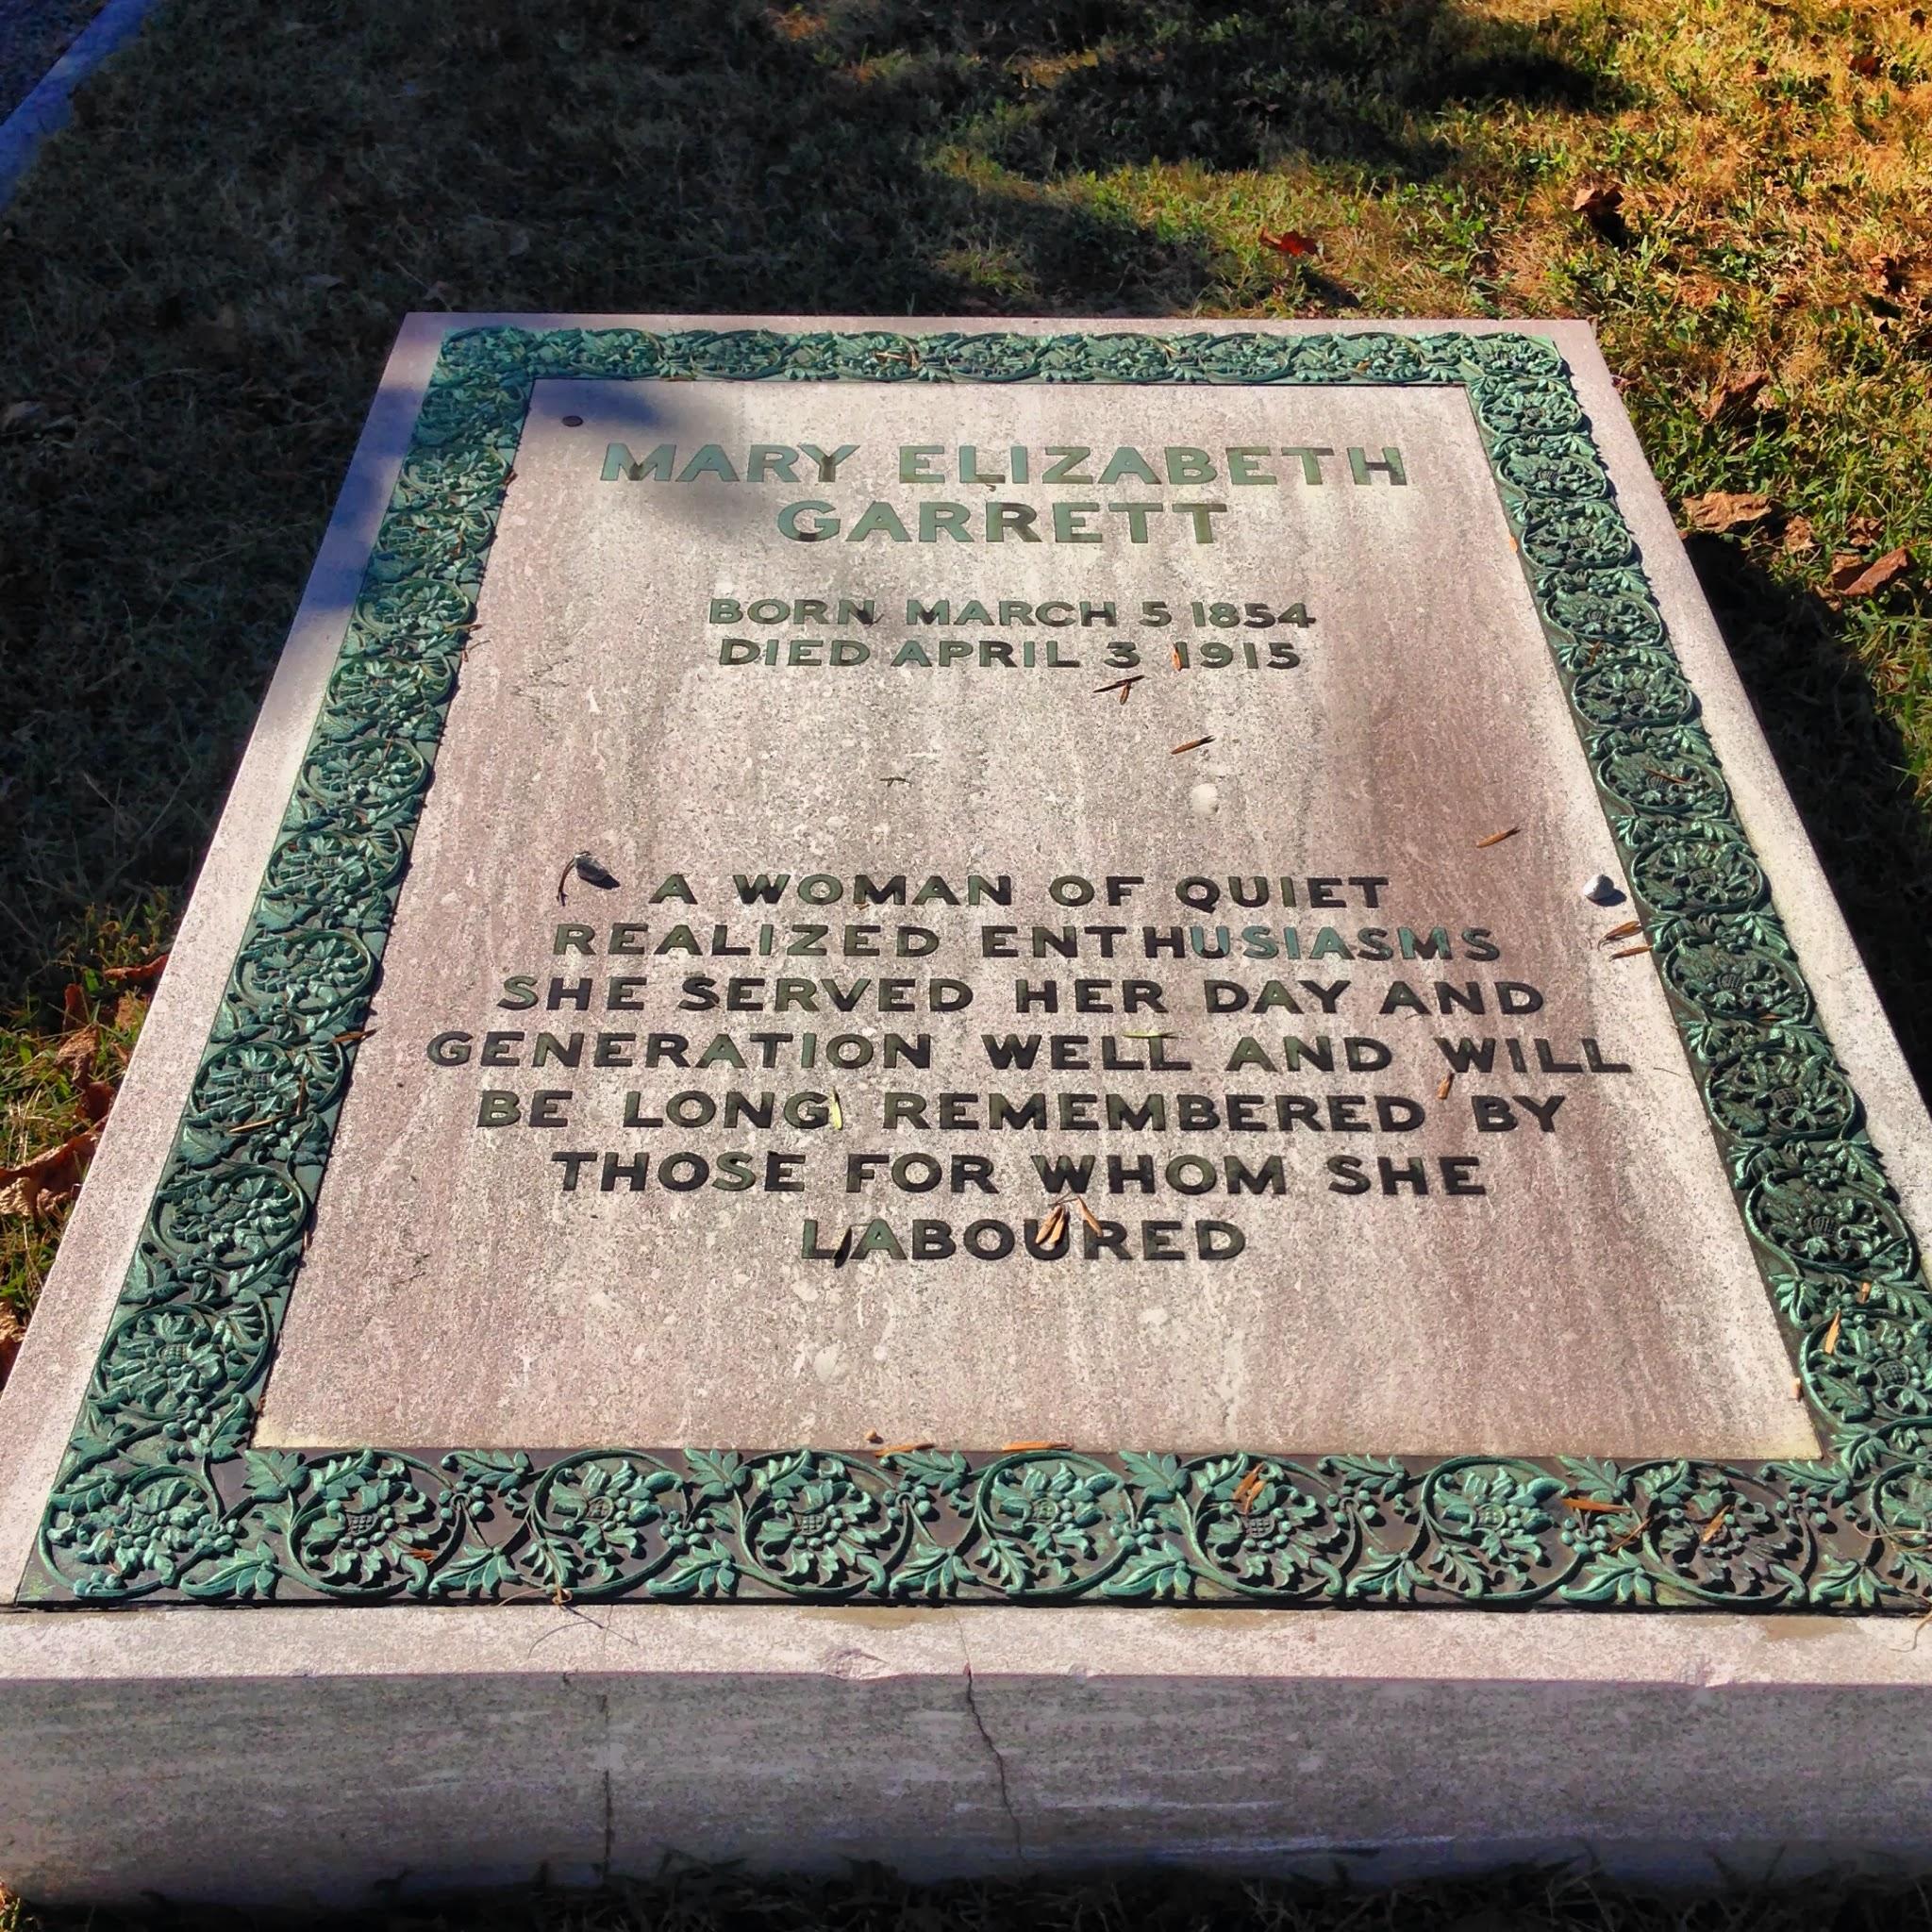 Gravesite of Mary Garrett in Baltimore's Green Mount Cemetery